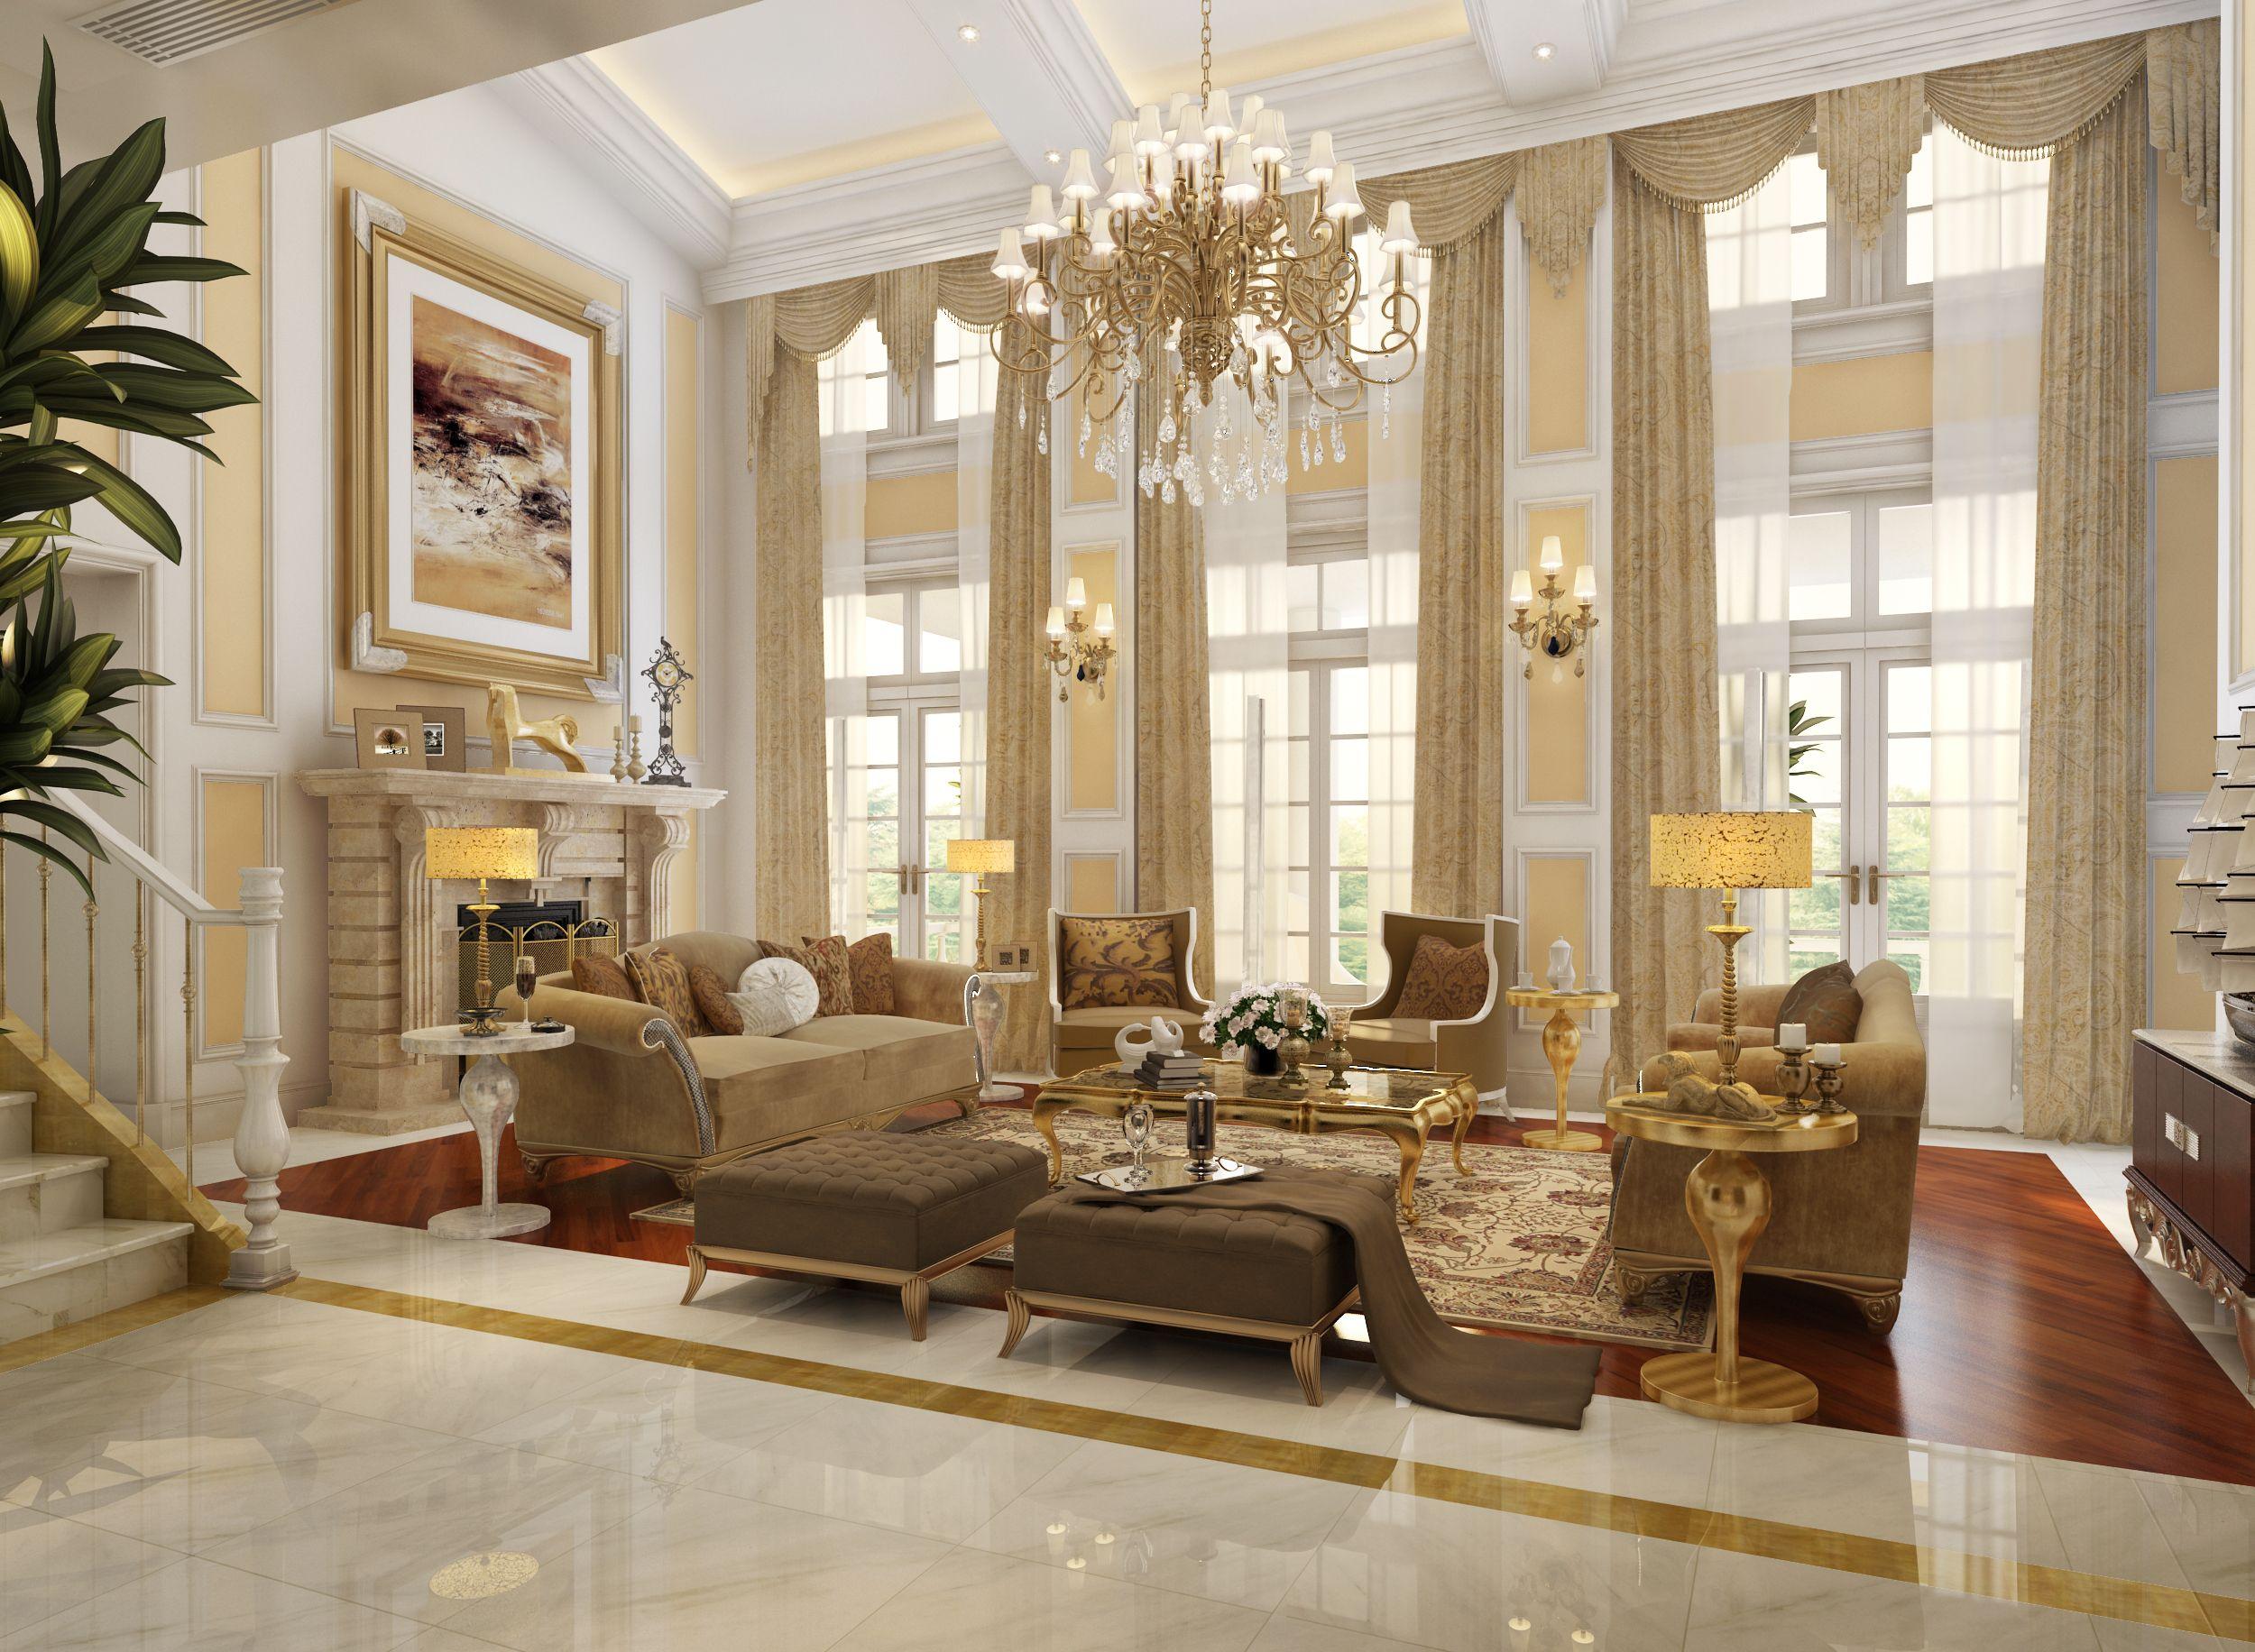 127 Luxury Living Room Design Ideas